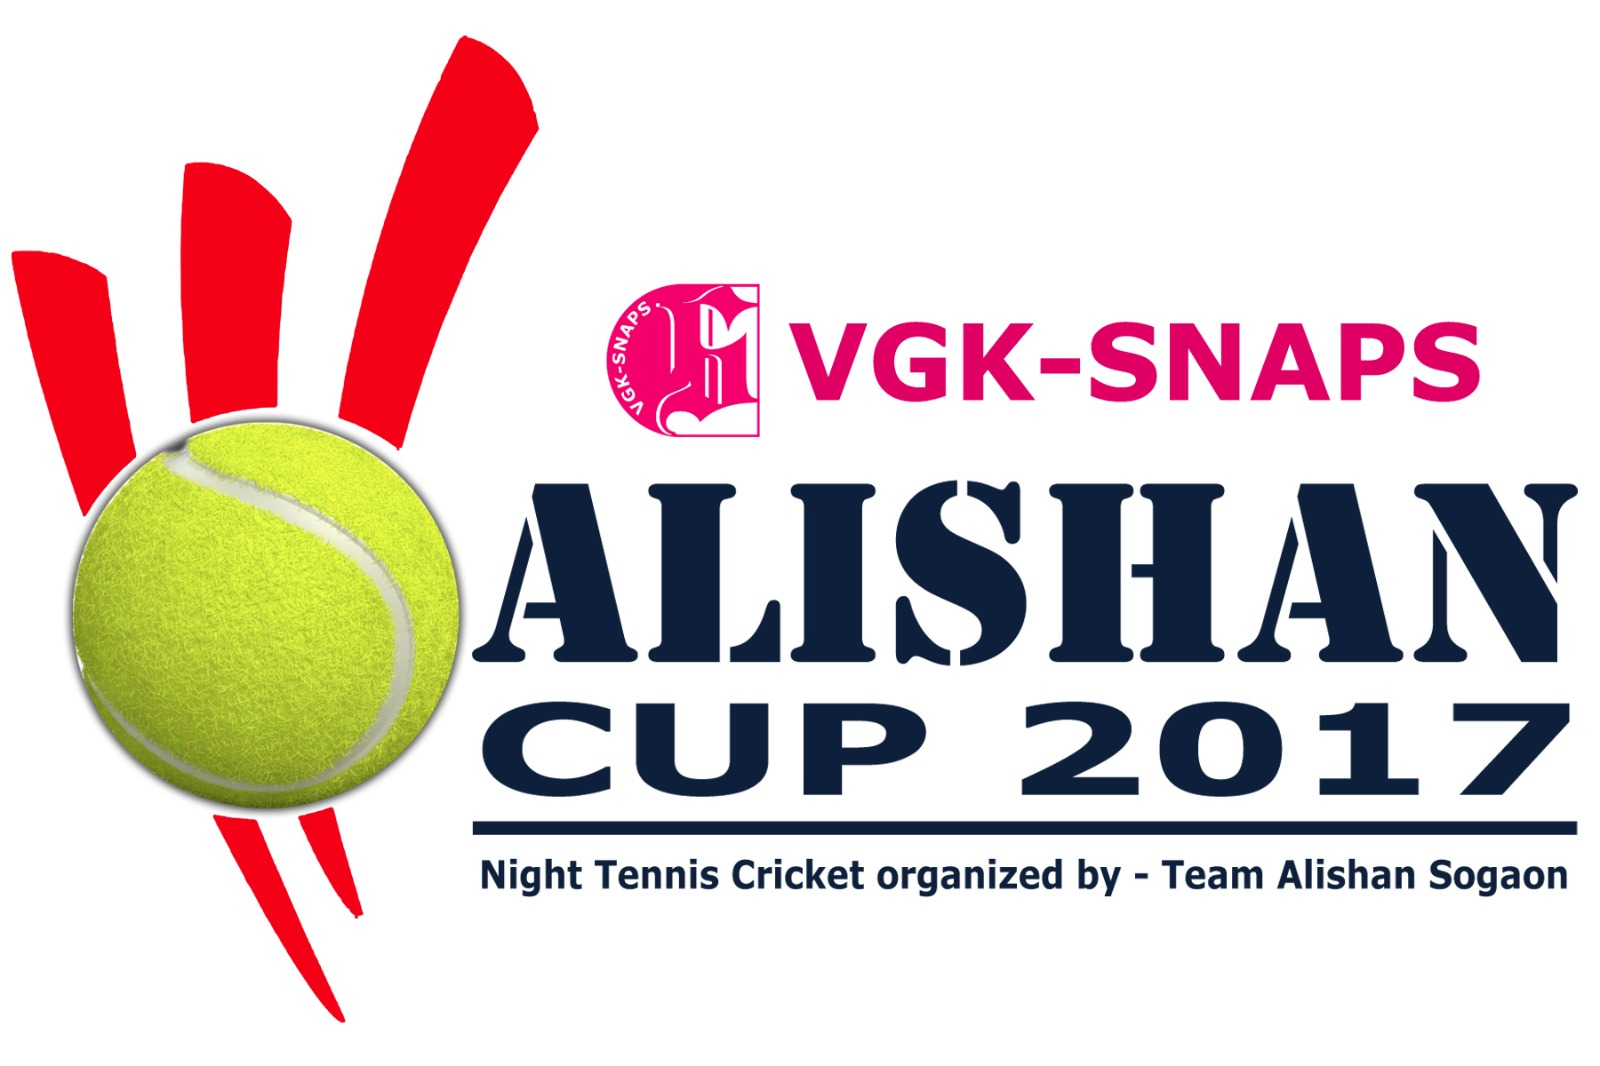 Alishan Cup 2017